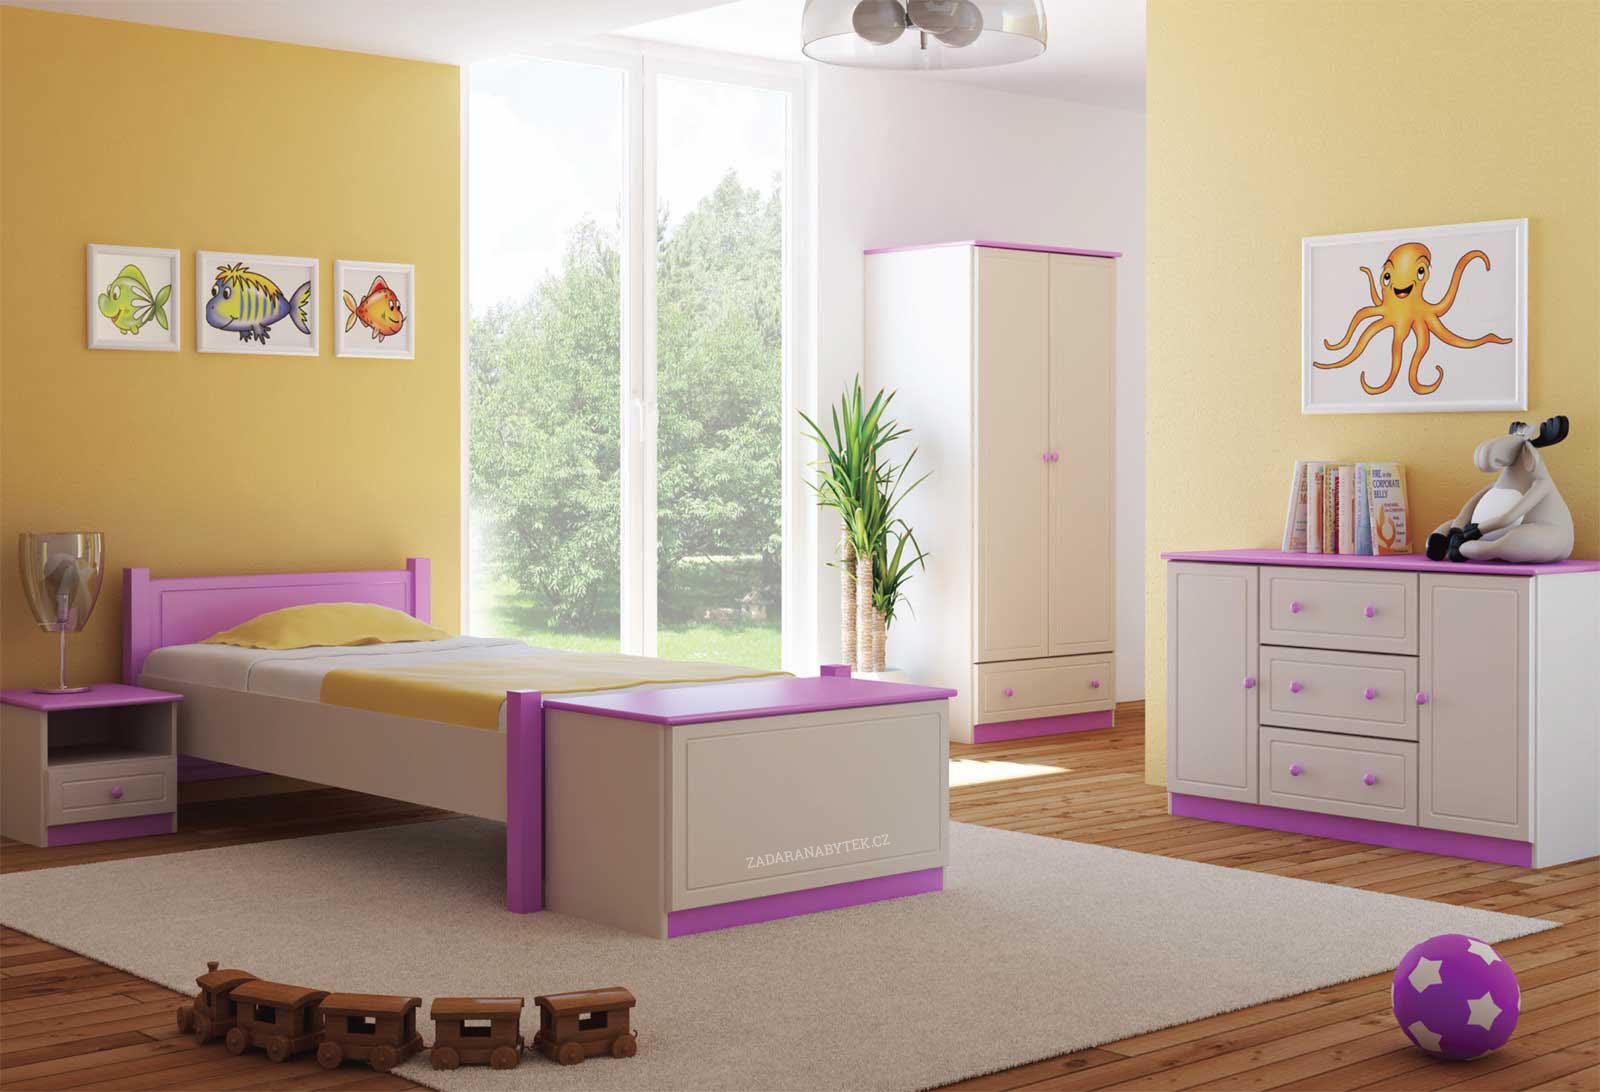 Dětský pokoj Kiks1